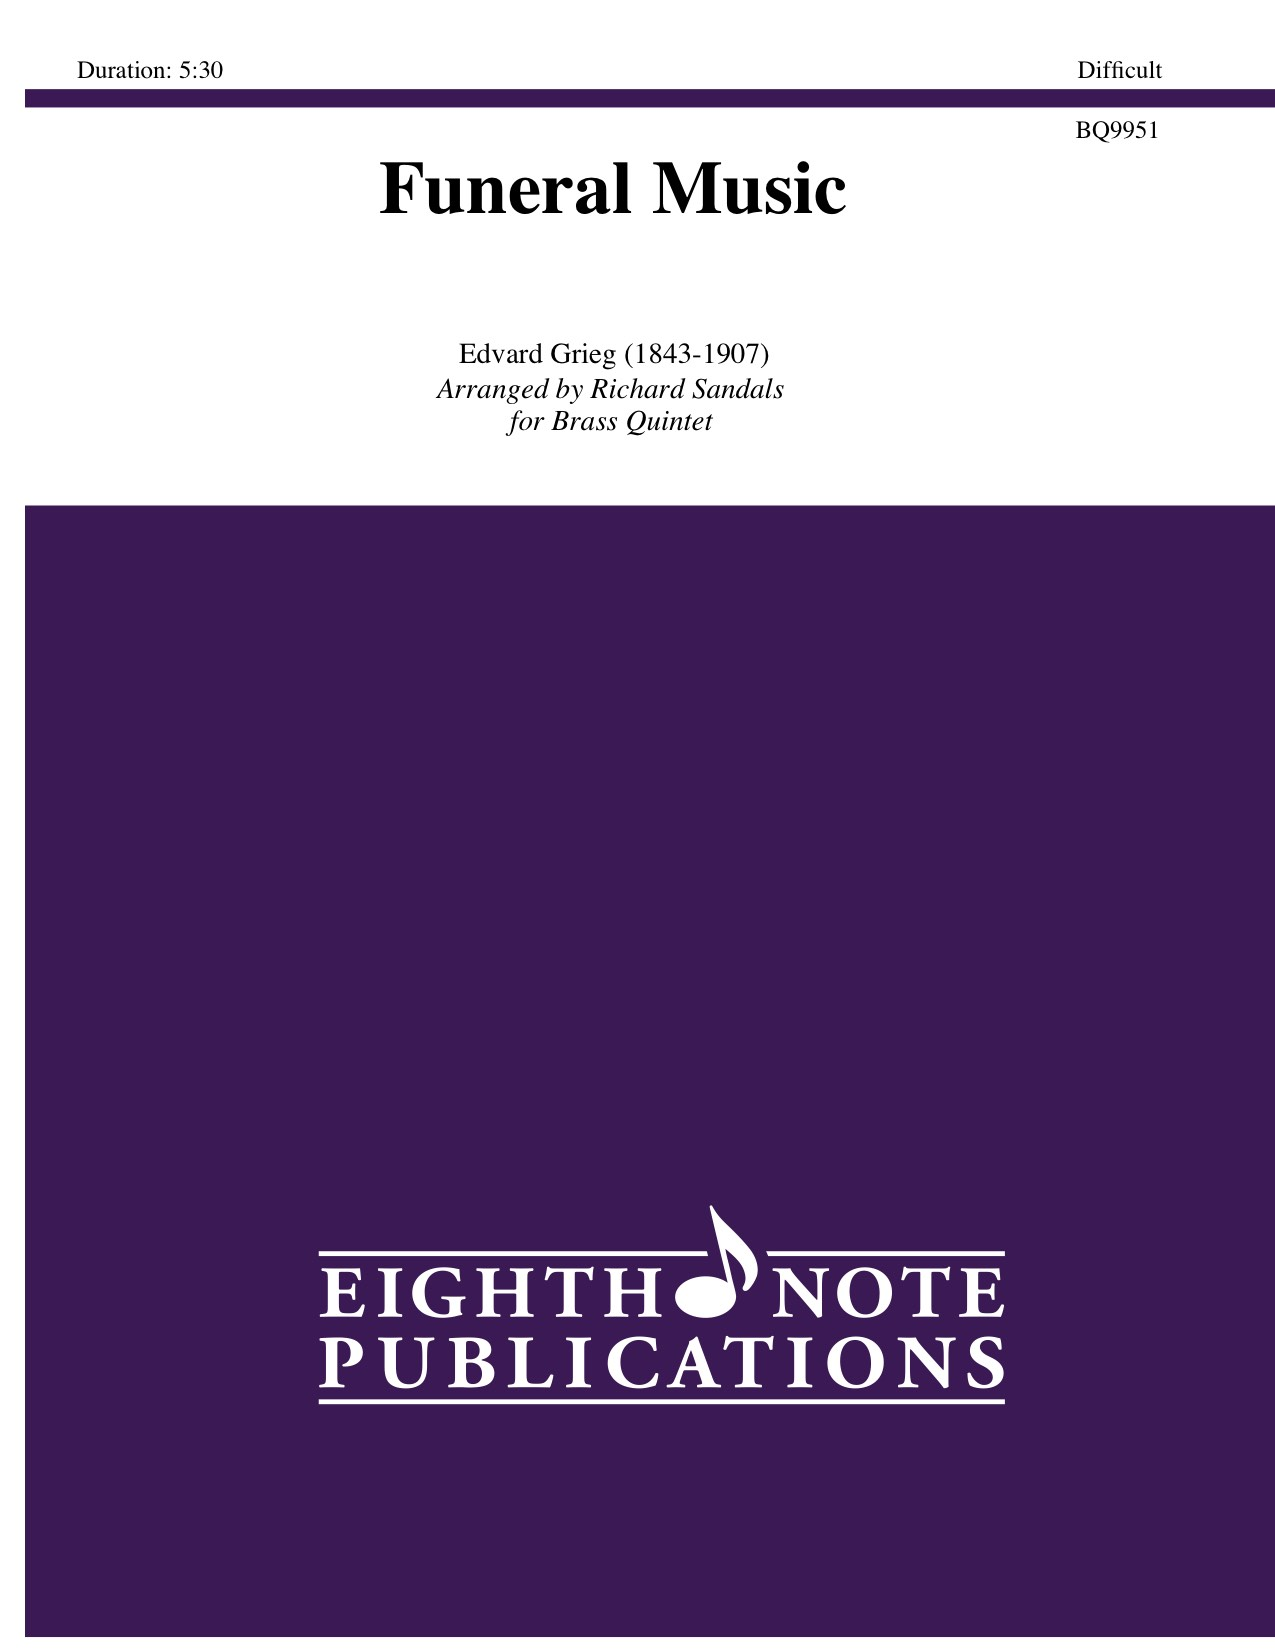 Funeral Music - Edvard Grieg